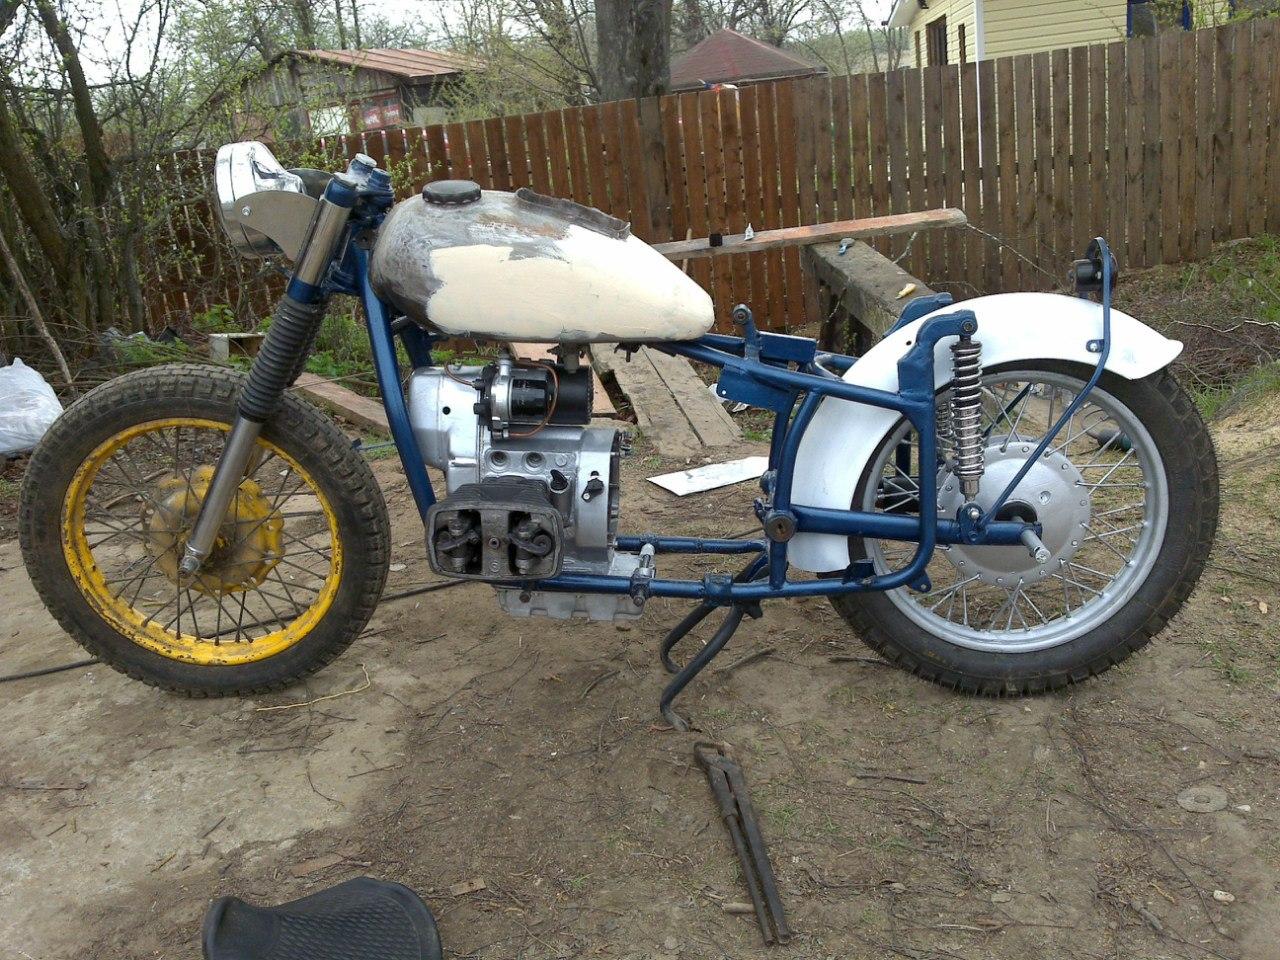 схема зажигания мотоцикла непар